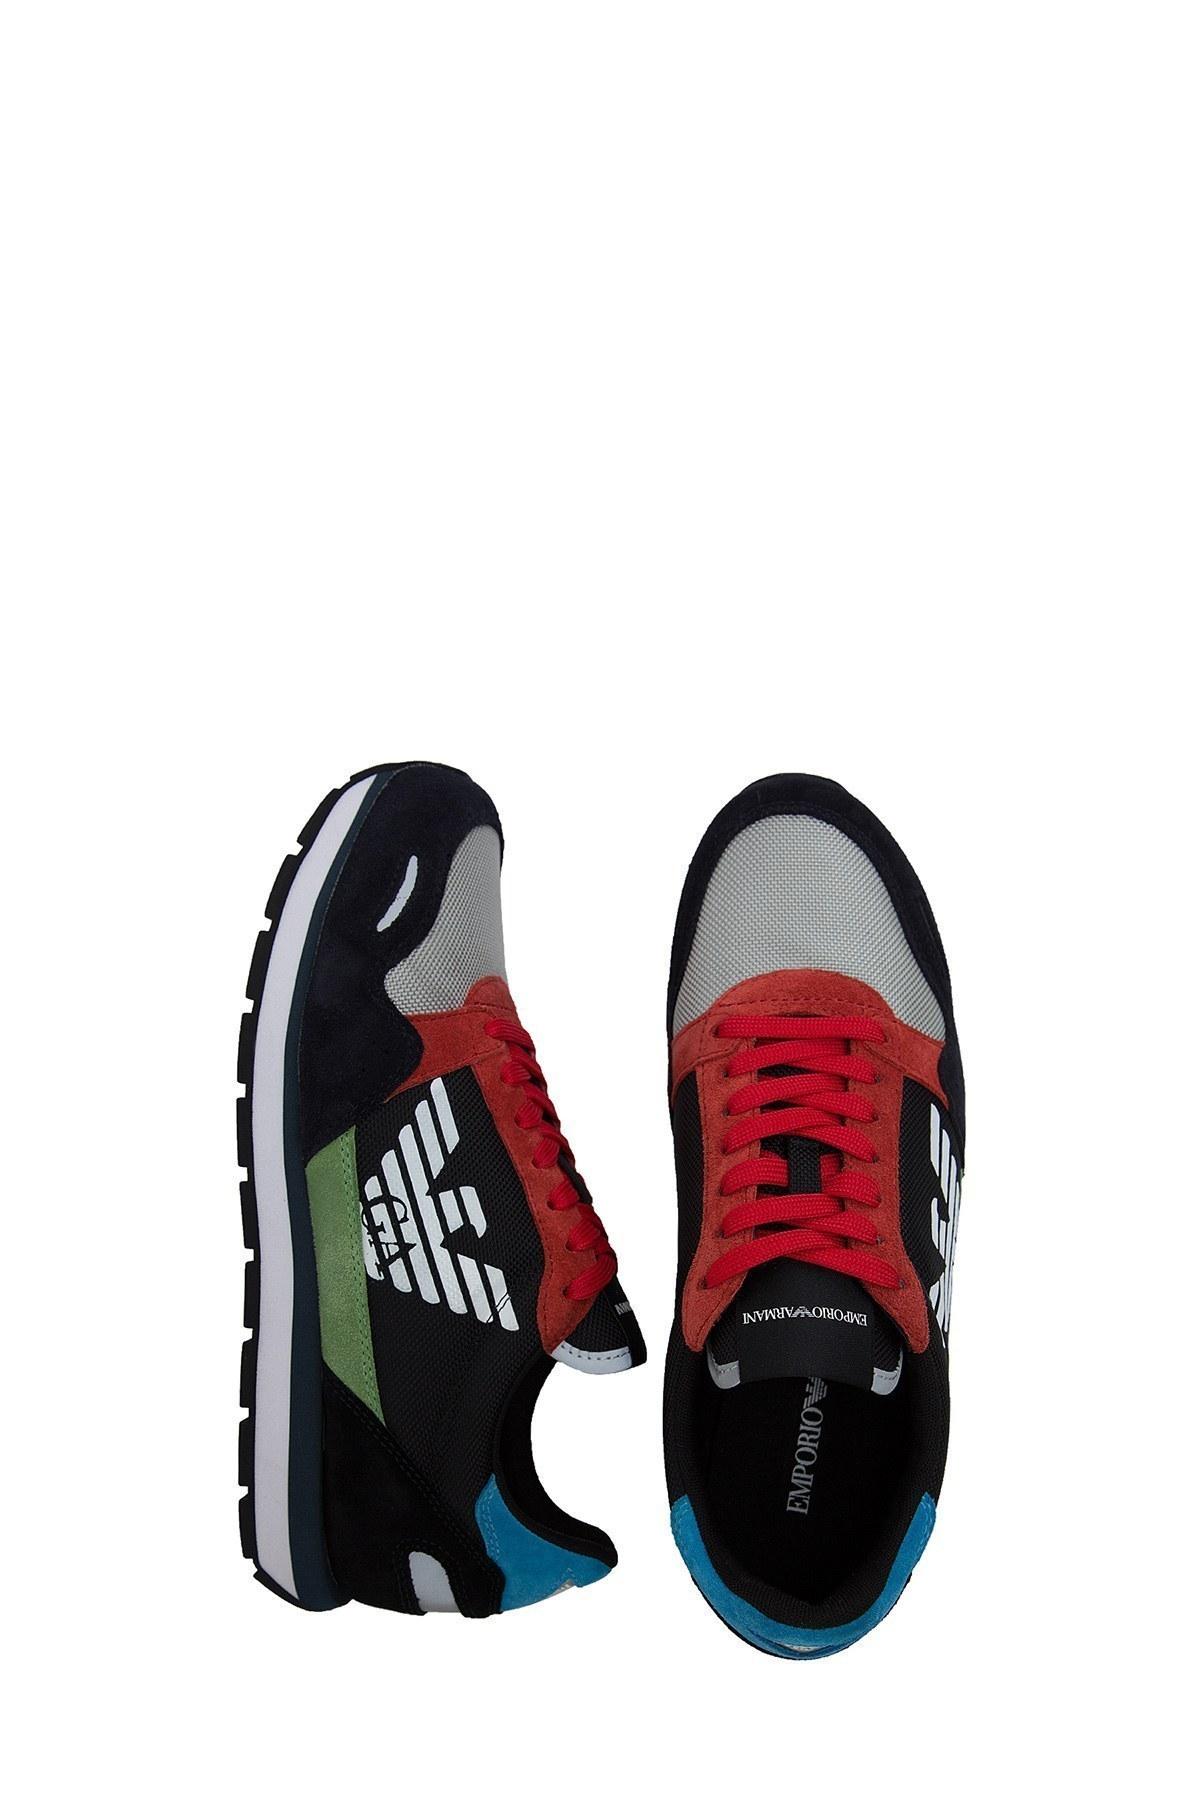 Emporio Armani Erkek Ayakkabı X4X215 XL200 A678 LACİVERT-KIRMIZI